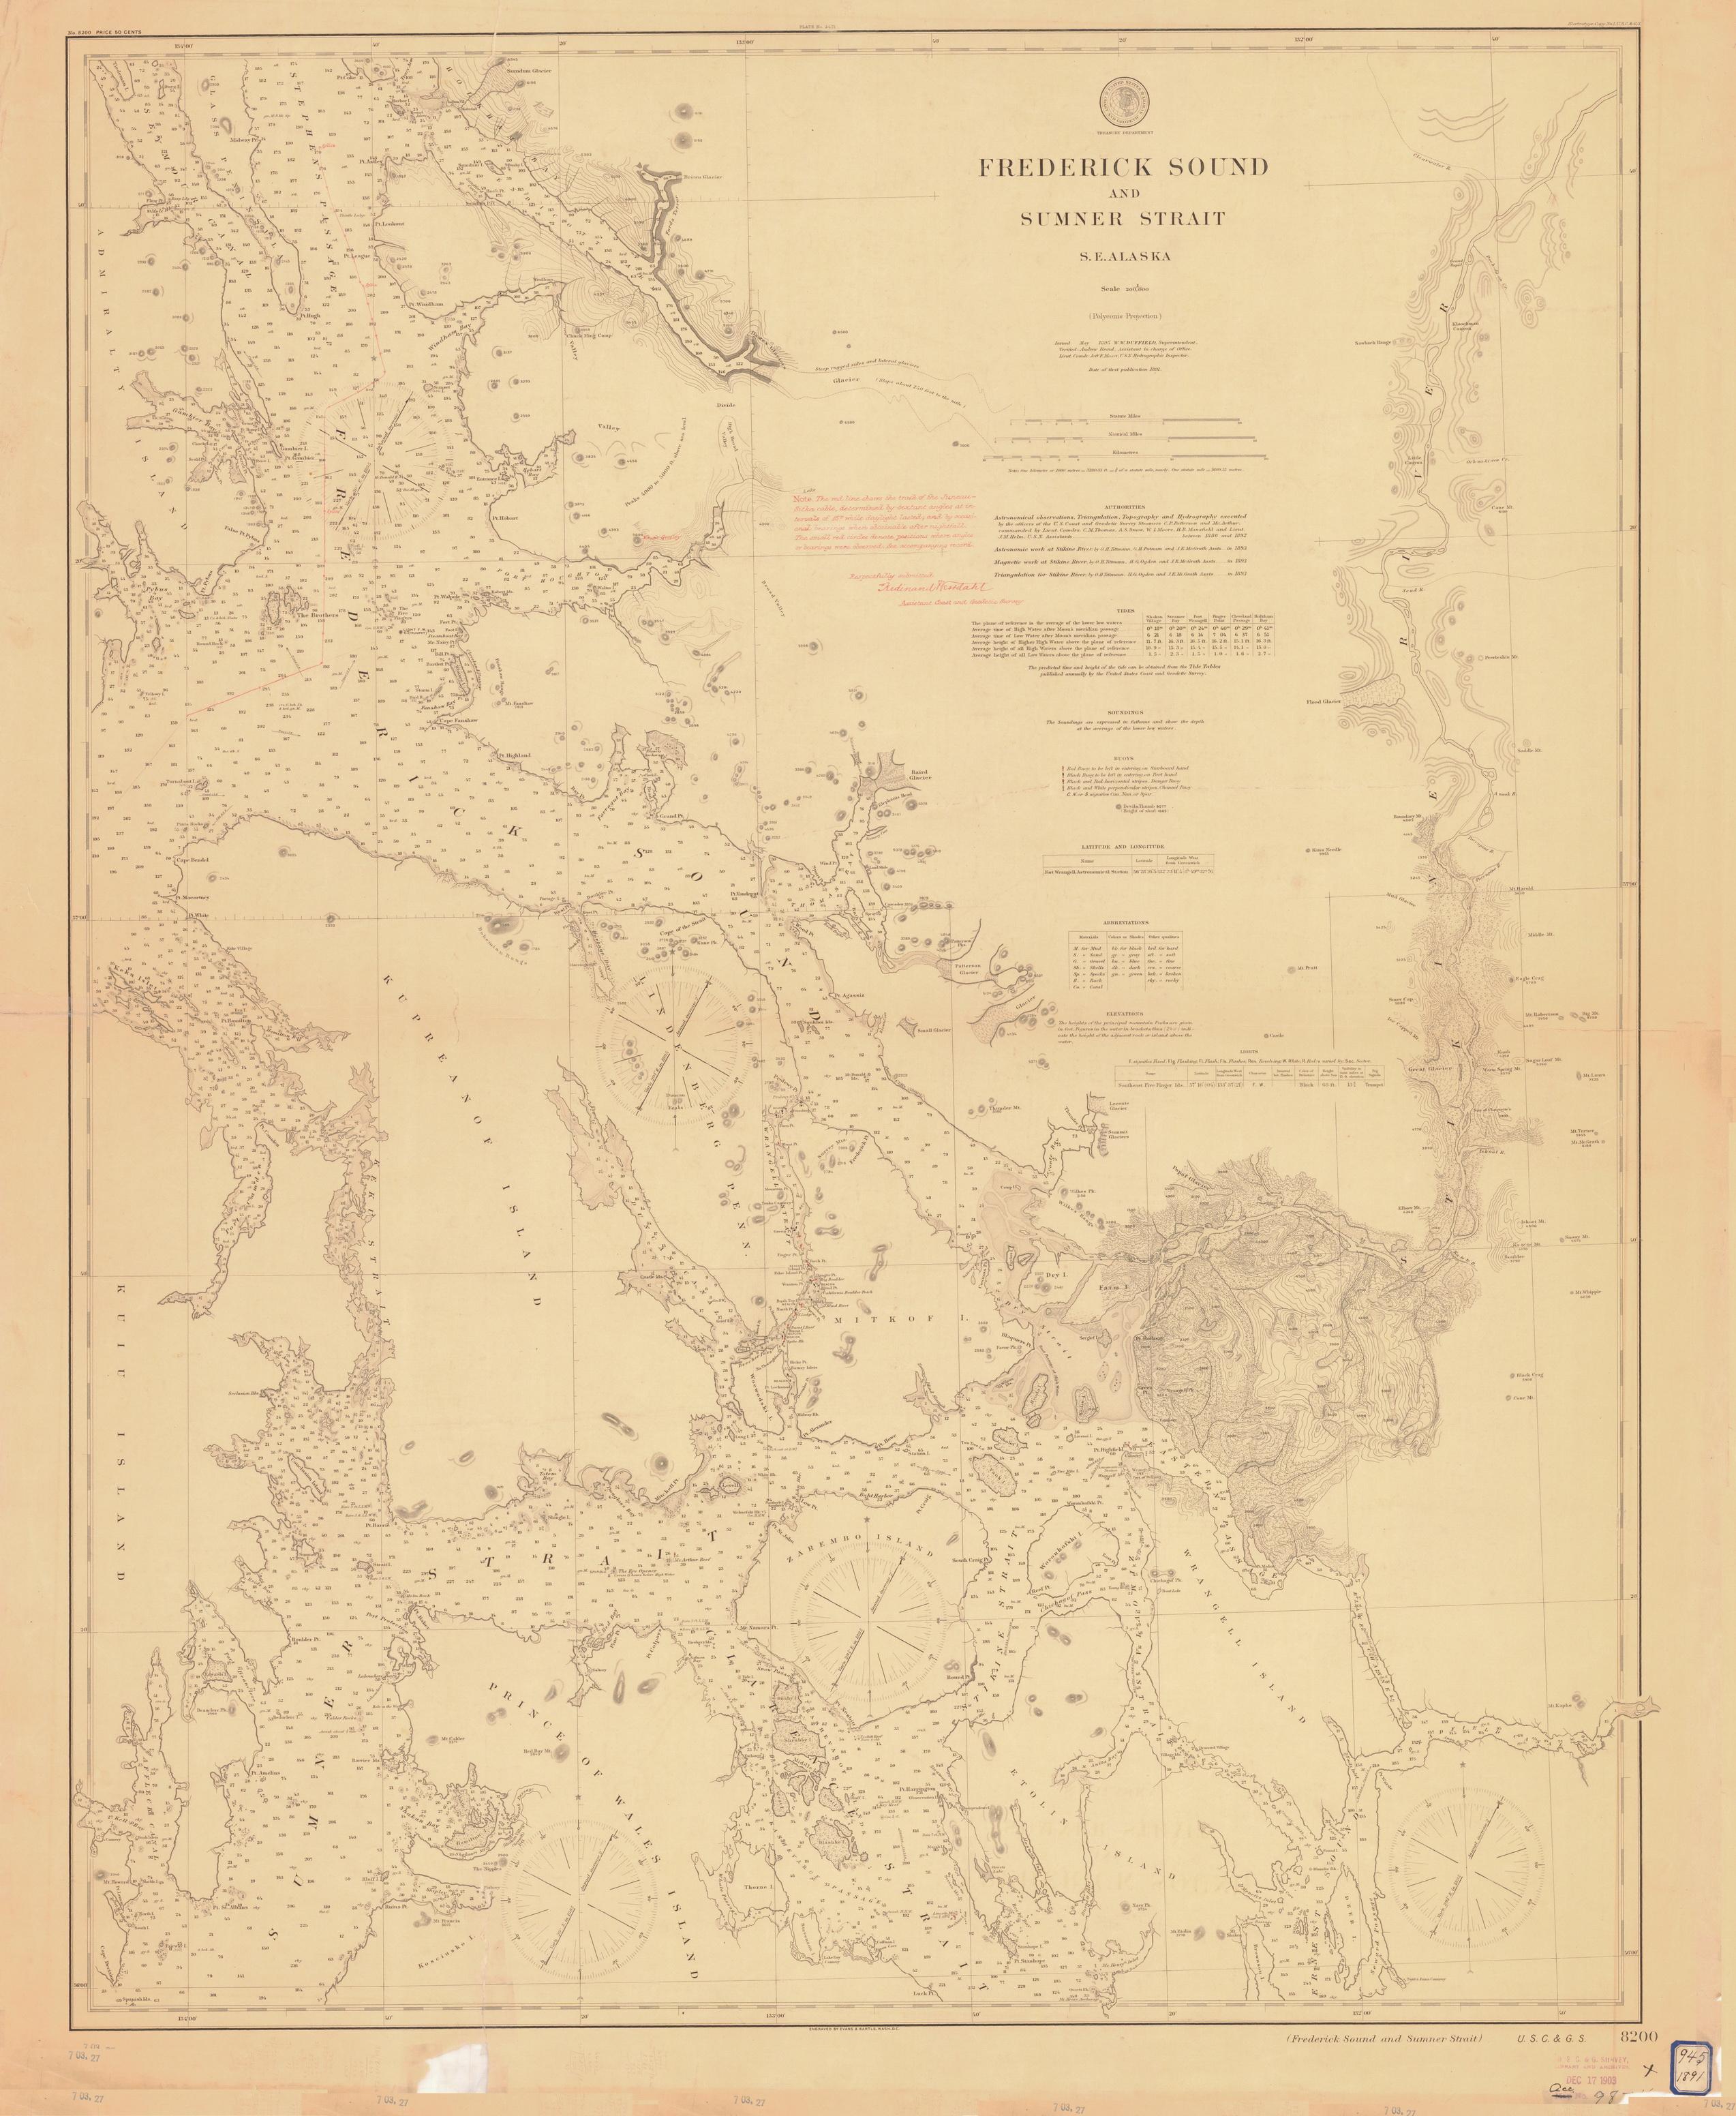 Frederick Sound Alaska Map.Frederick Sound And Sumner Strait 1895 Nautical Chart 200 000 Scale